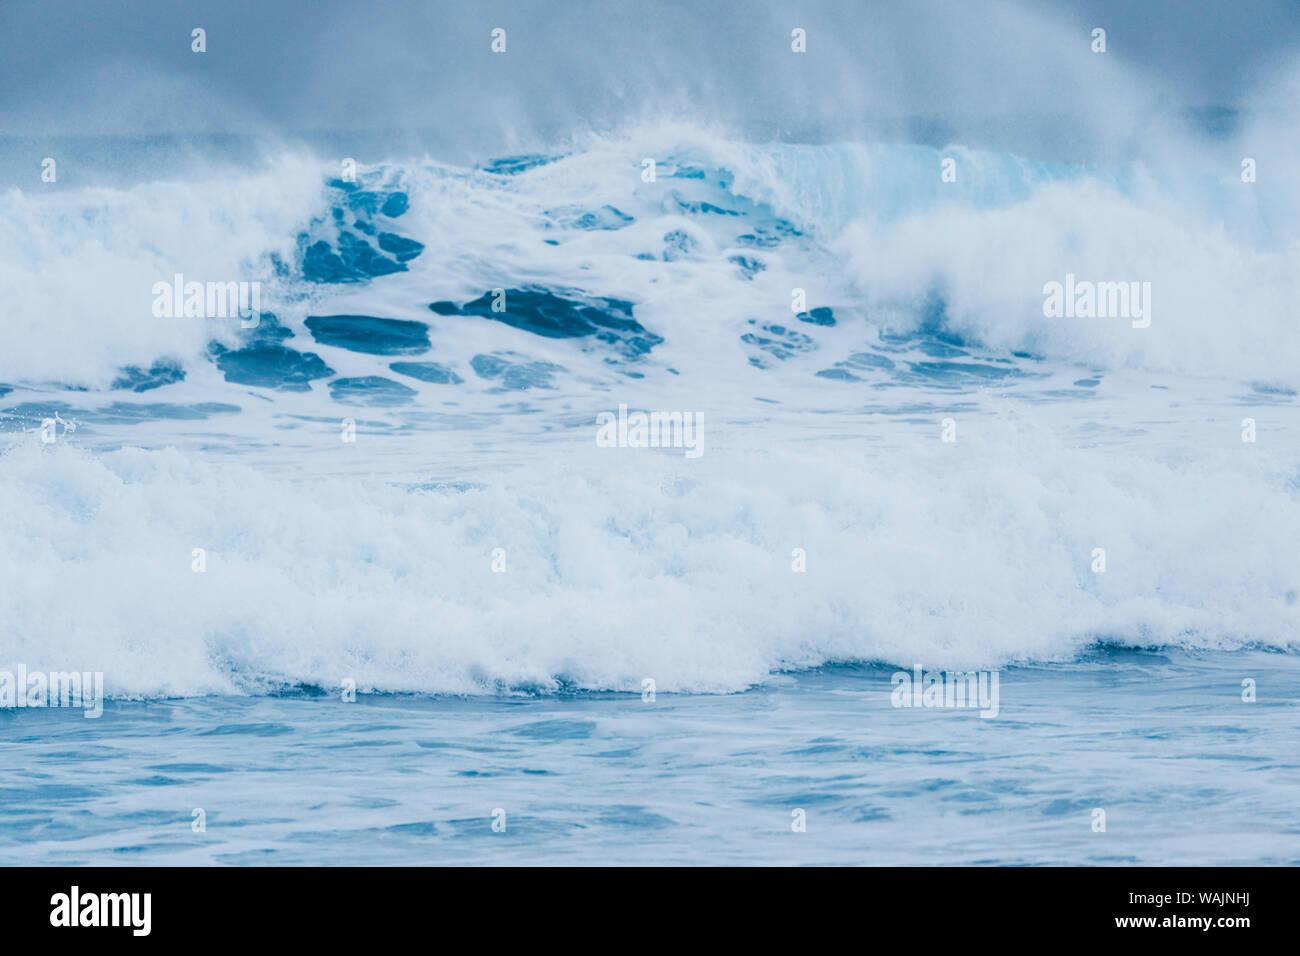 Norway, Lofoten Islands, Vestvag Island, Unstad. Waves along the coast near Unstad are popular for surfers even in winter. Stock Photo